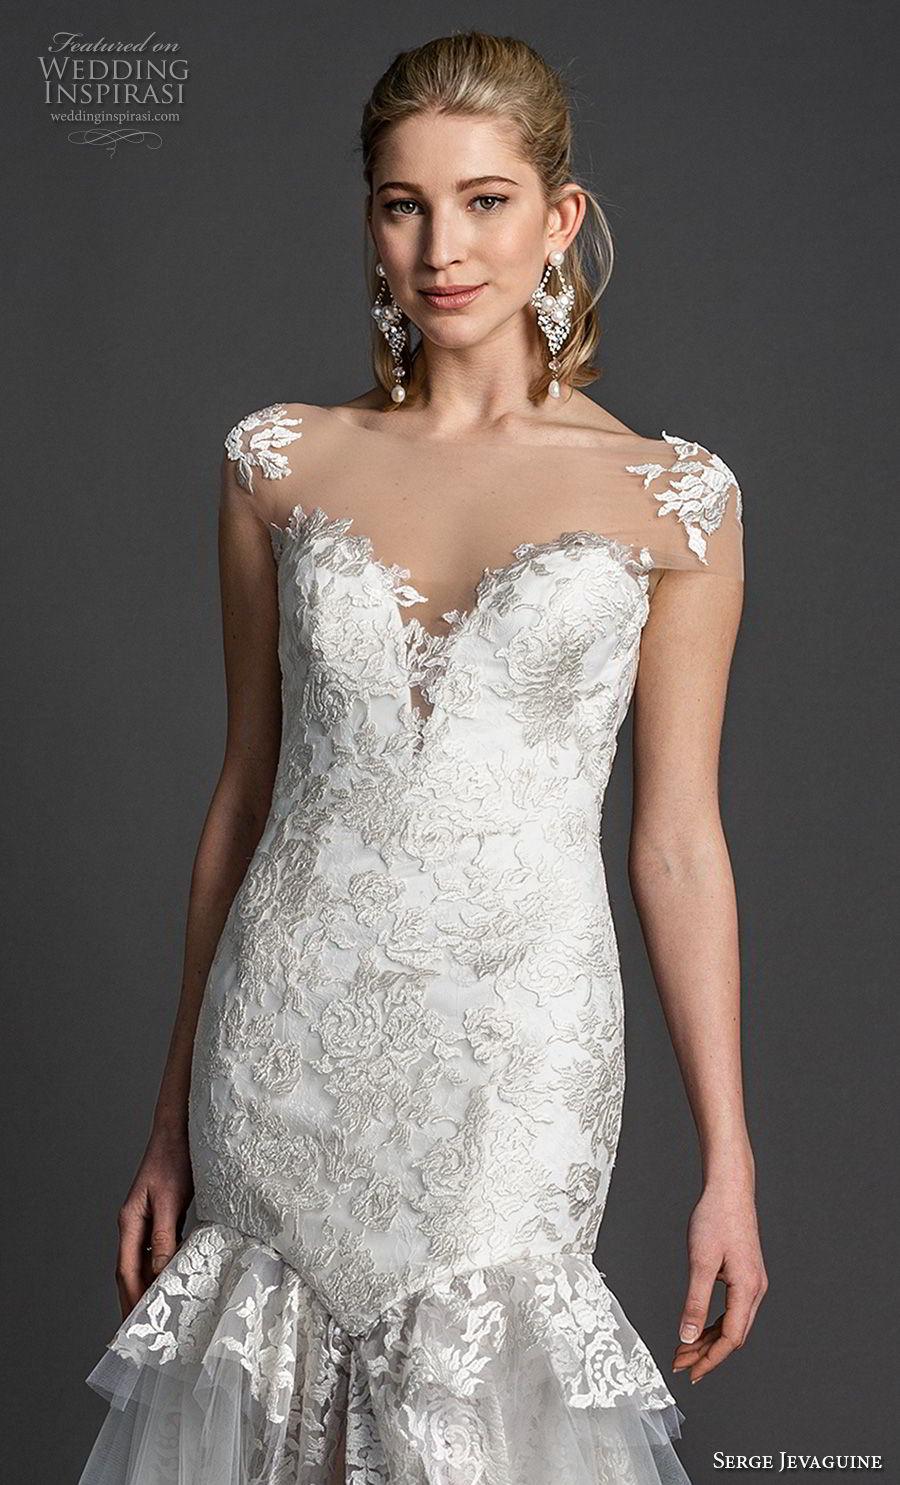 serge jevaguine 2019 bridal cap sleeves illusion bateau deep sweetheart neckline full embellishment elegant mermaid wedding dress open back chapel train (2) zv